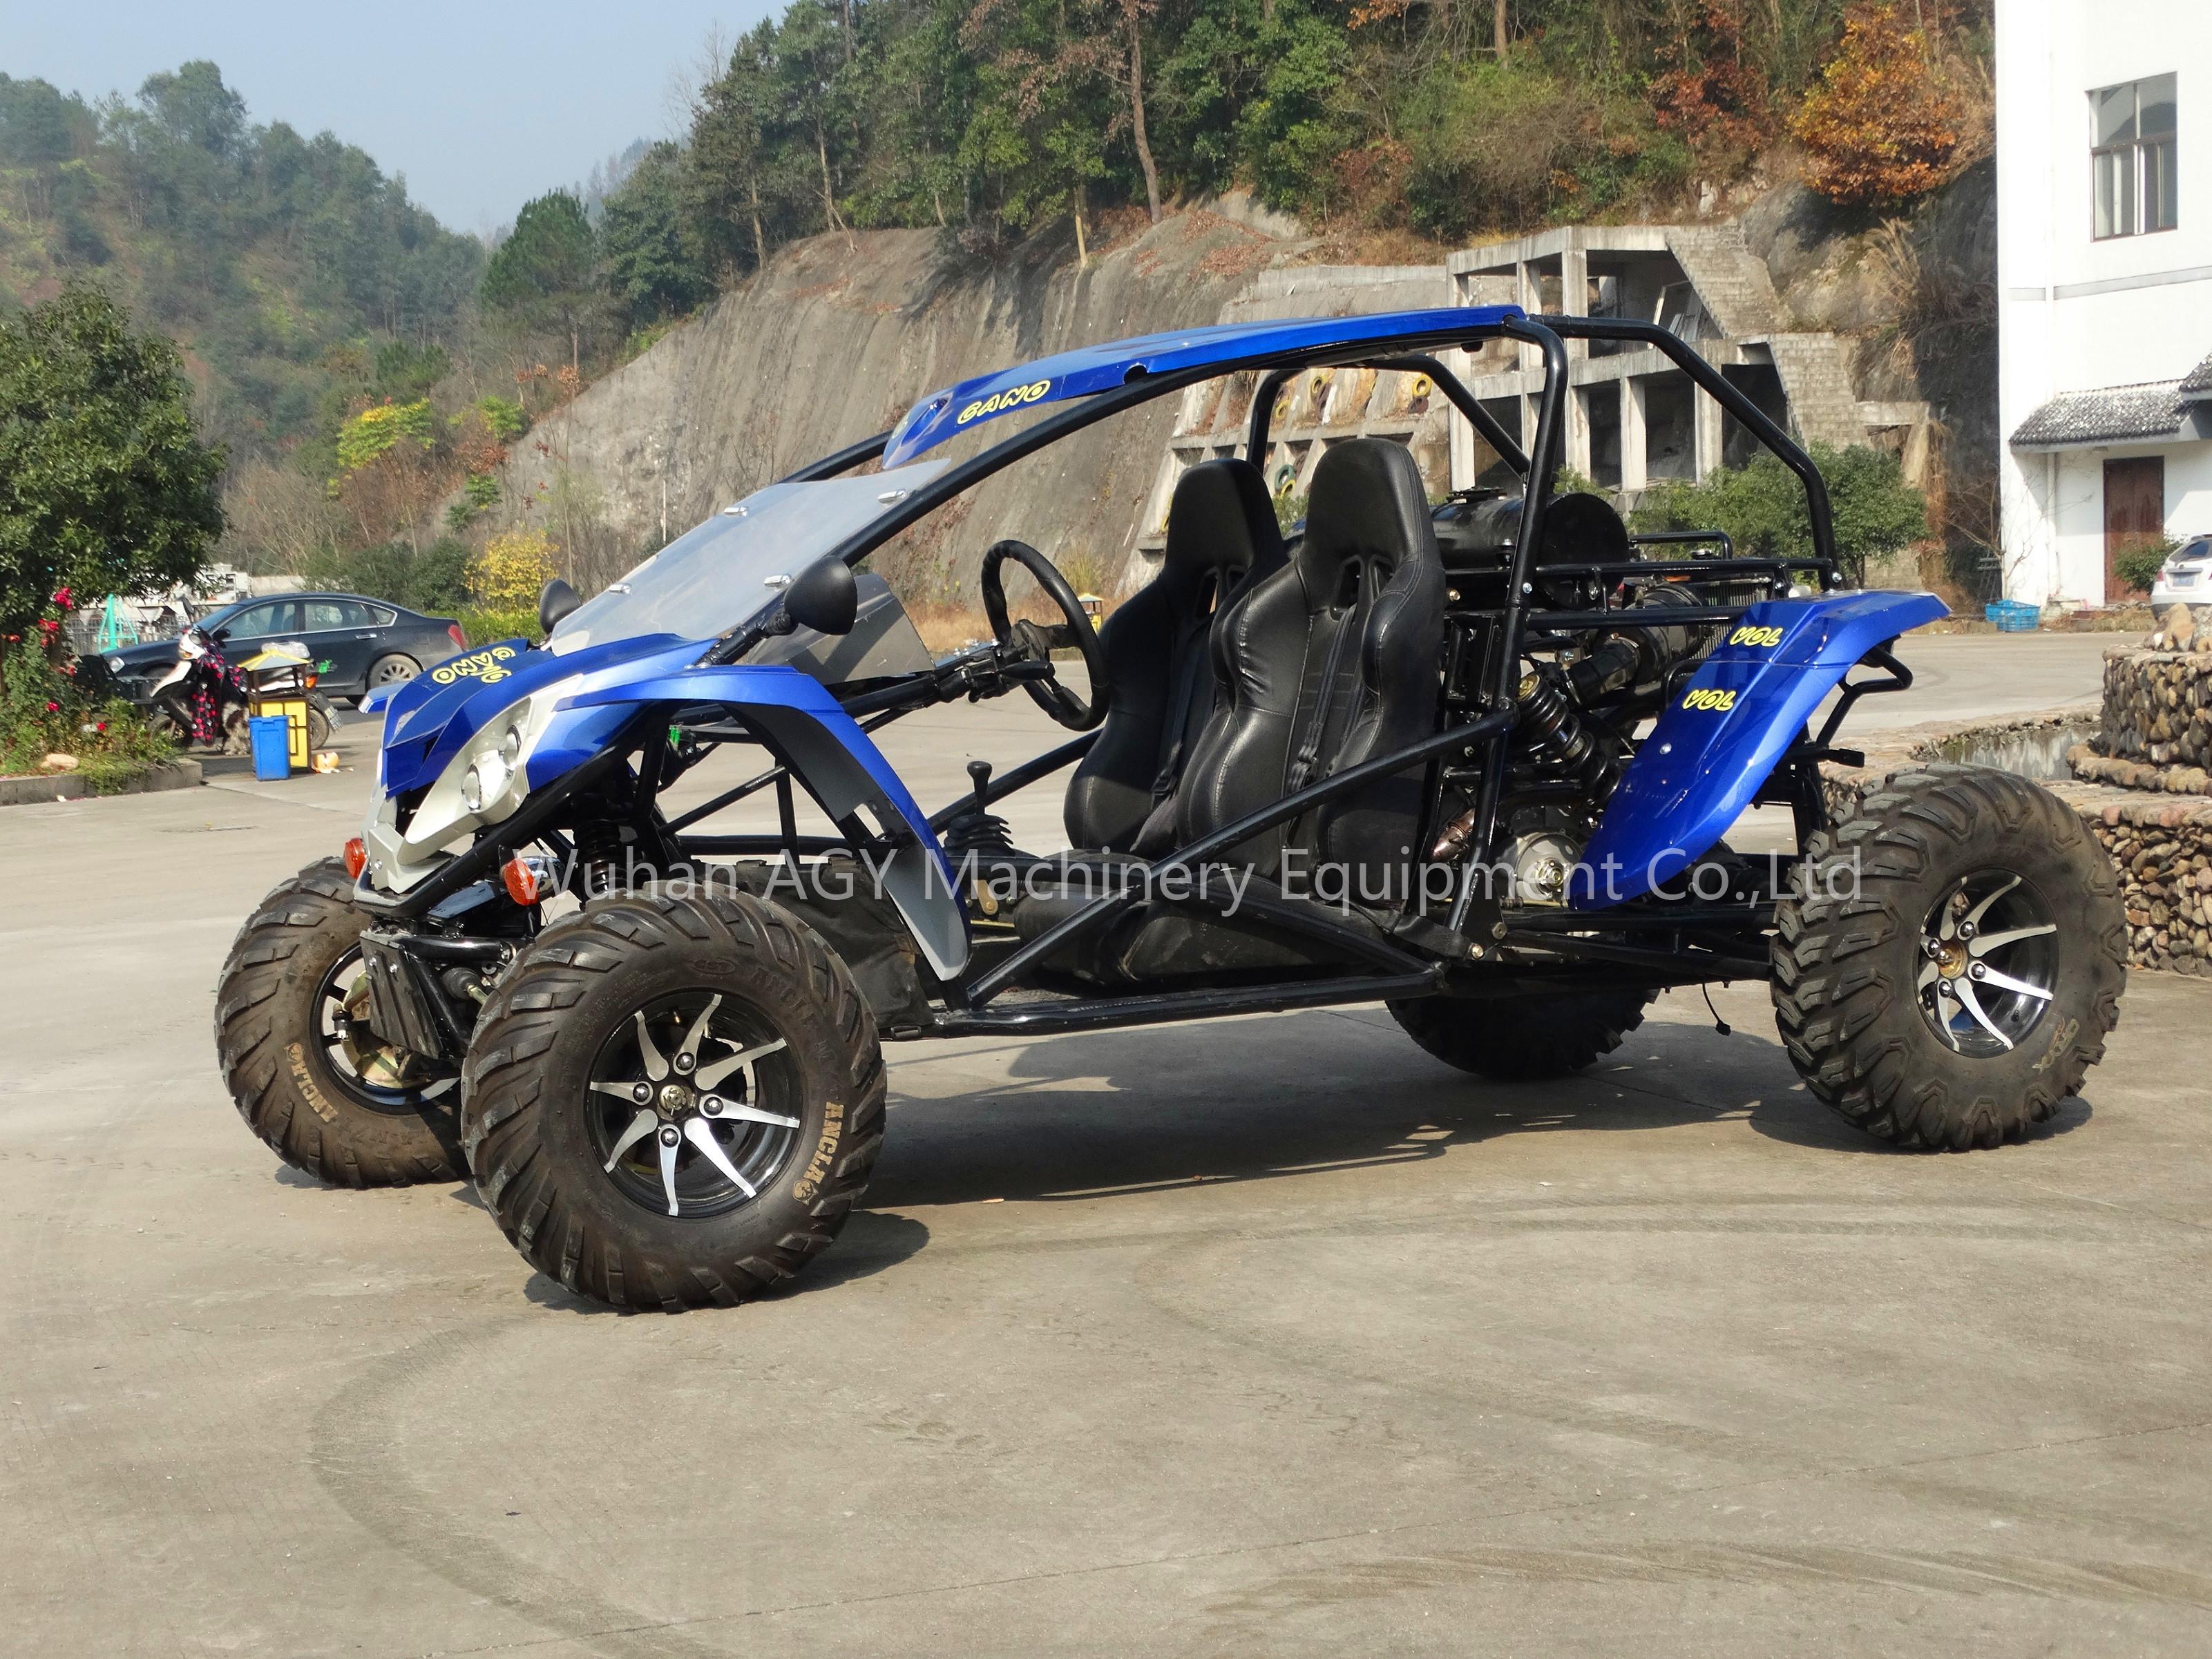 AGY utility performance 1100cc utv 4x4 buggy